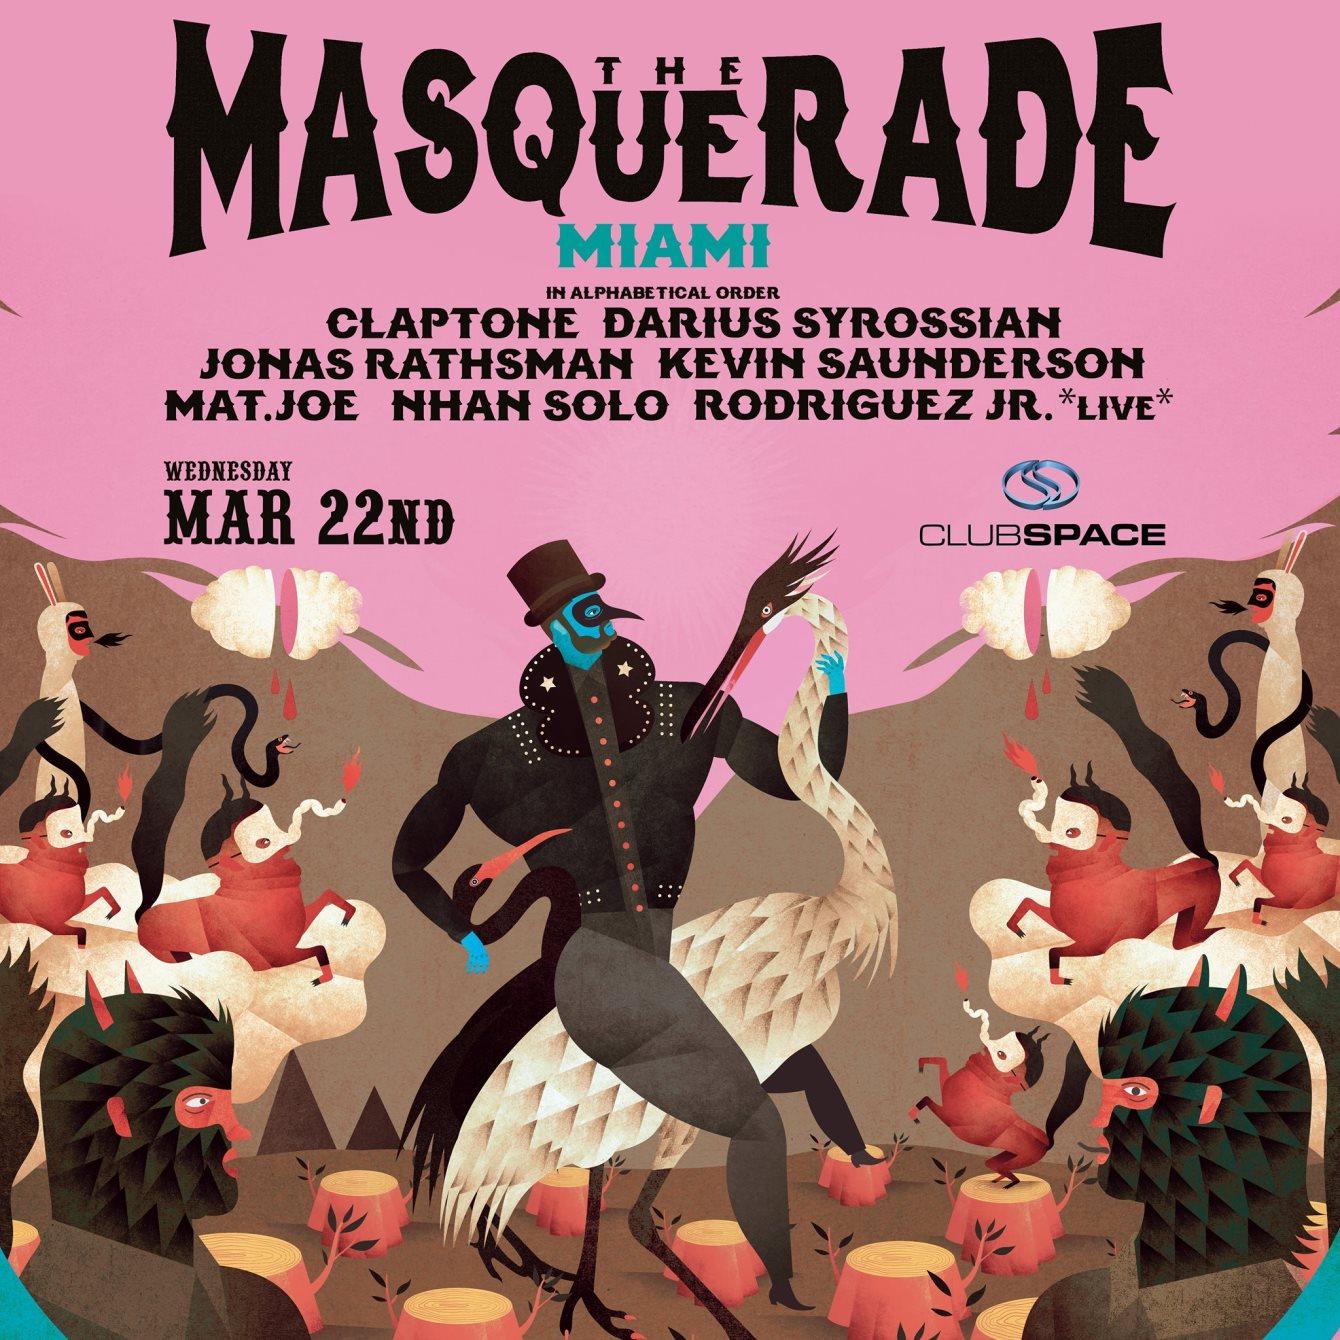 Claptone presents Masquerade Miami - Terrace - Flyer front